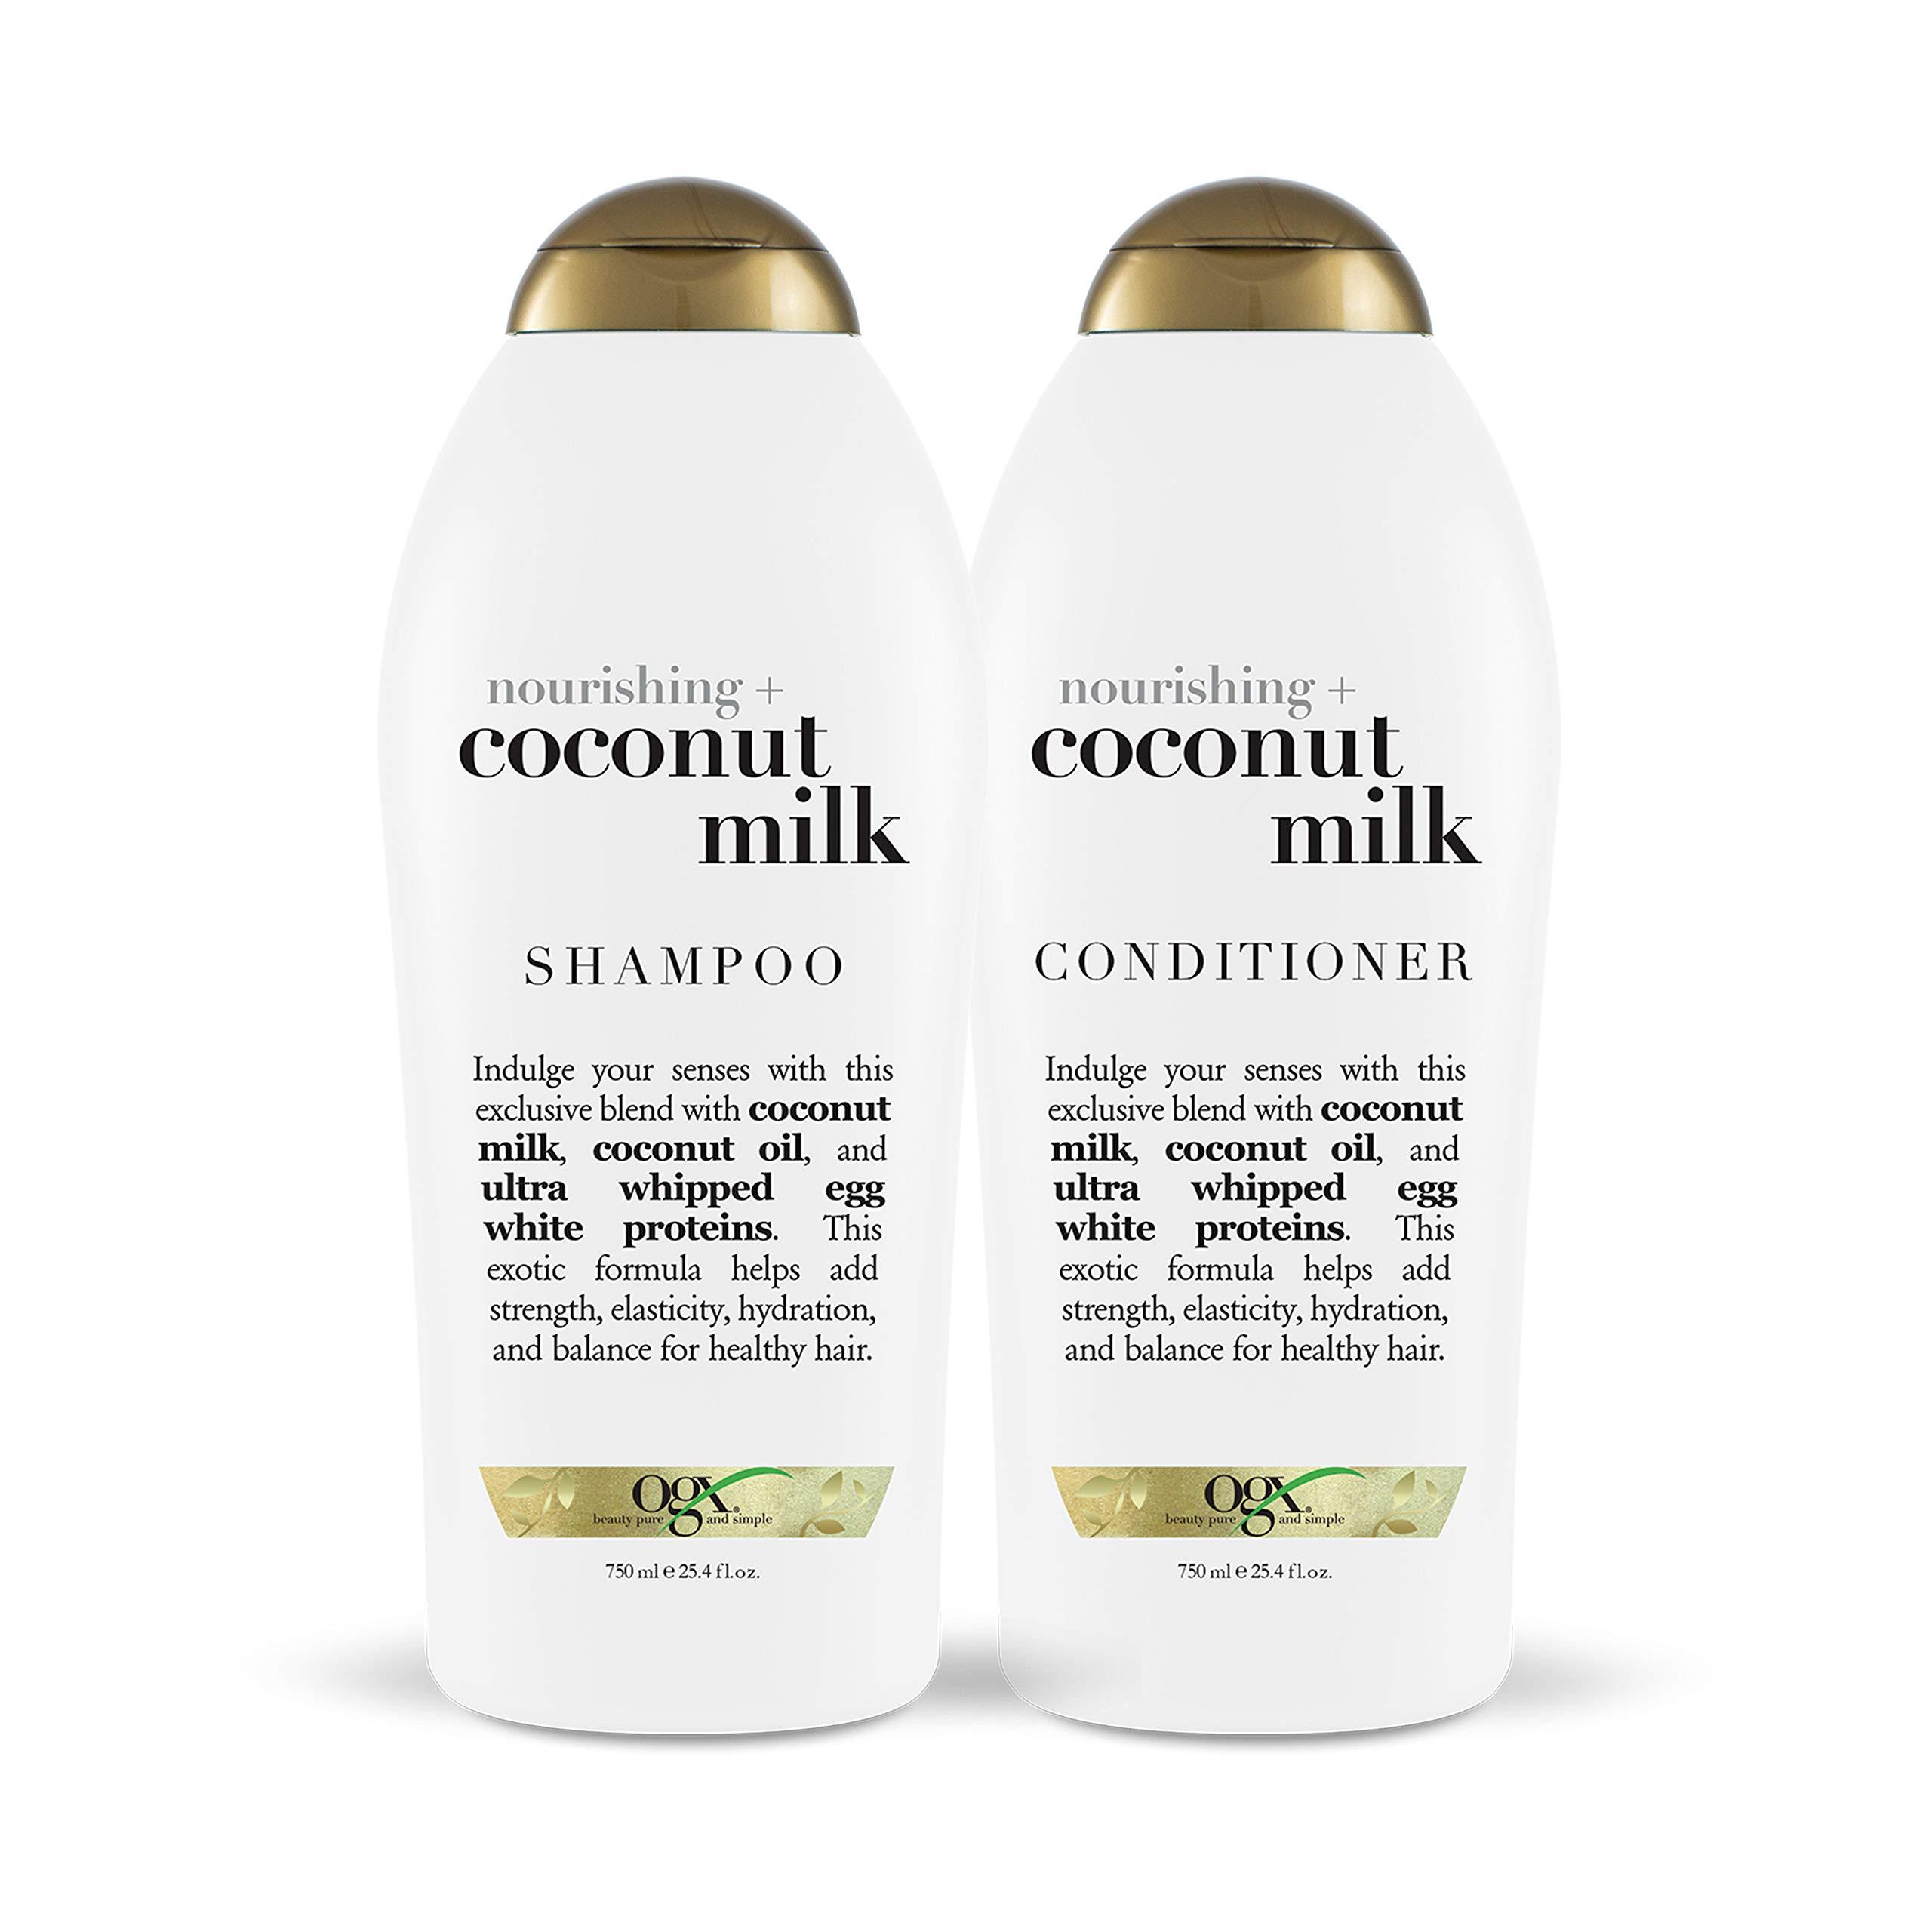 OGX Nourishing + Coconut Milk Shampoo & Conditioner Set, 25.4 Ounce (Set of 2) by OGX